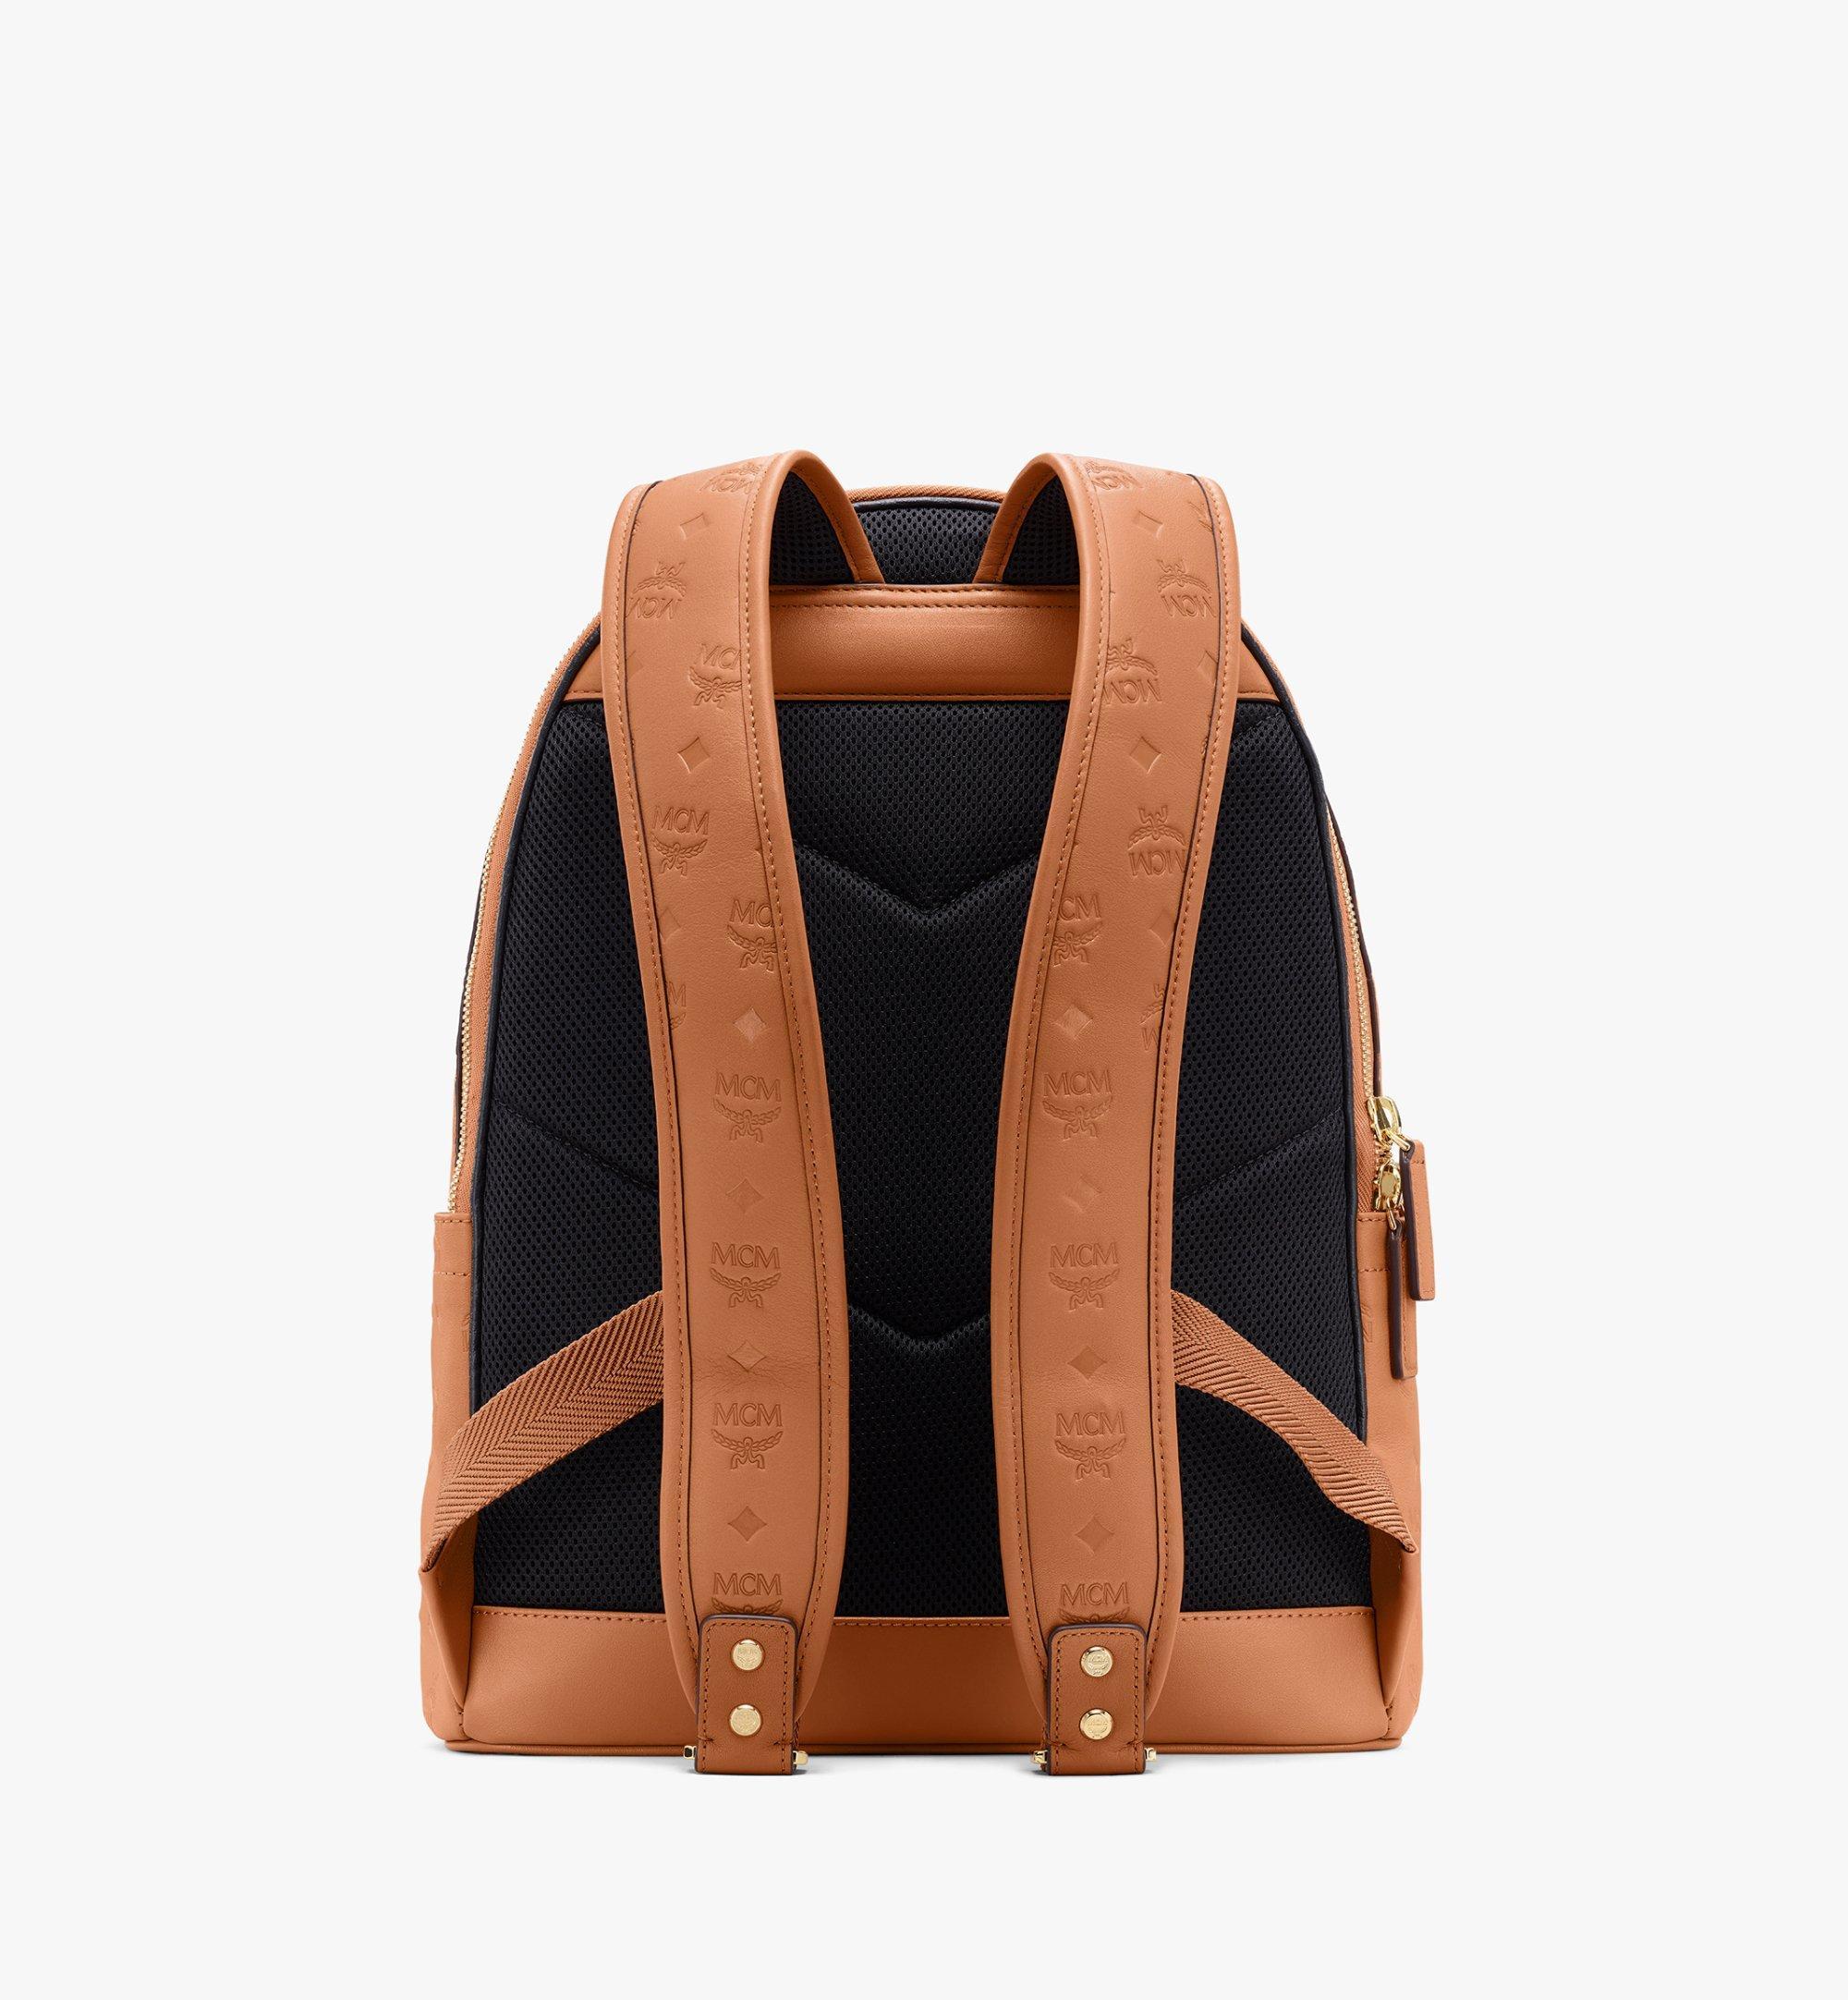 MCM Stark Backpack in Monogram Leather Cognac MMKASVE09CO001 Alternate View 3